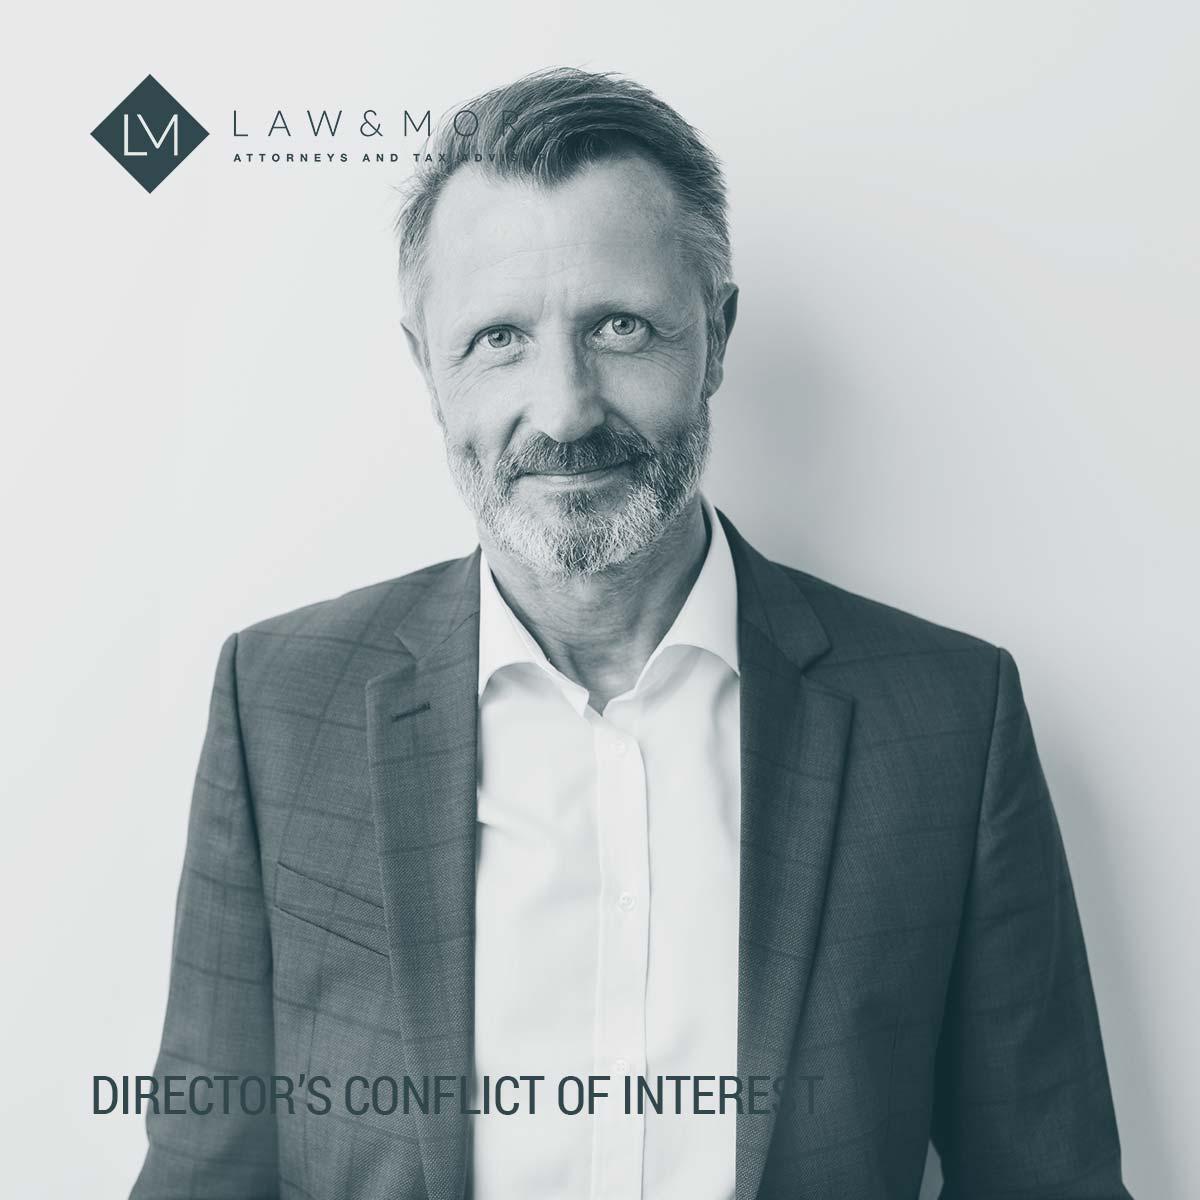 Gambar konflik kepentingan direktur